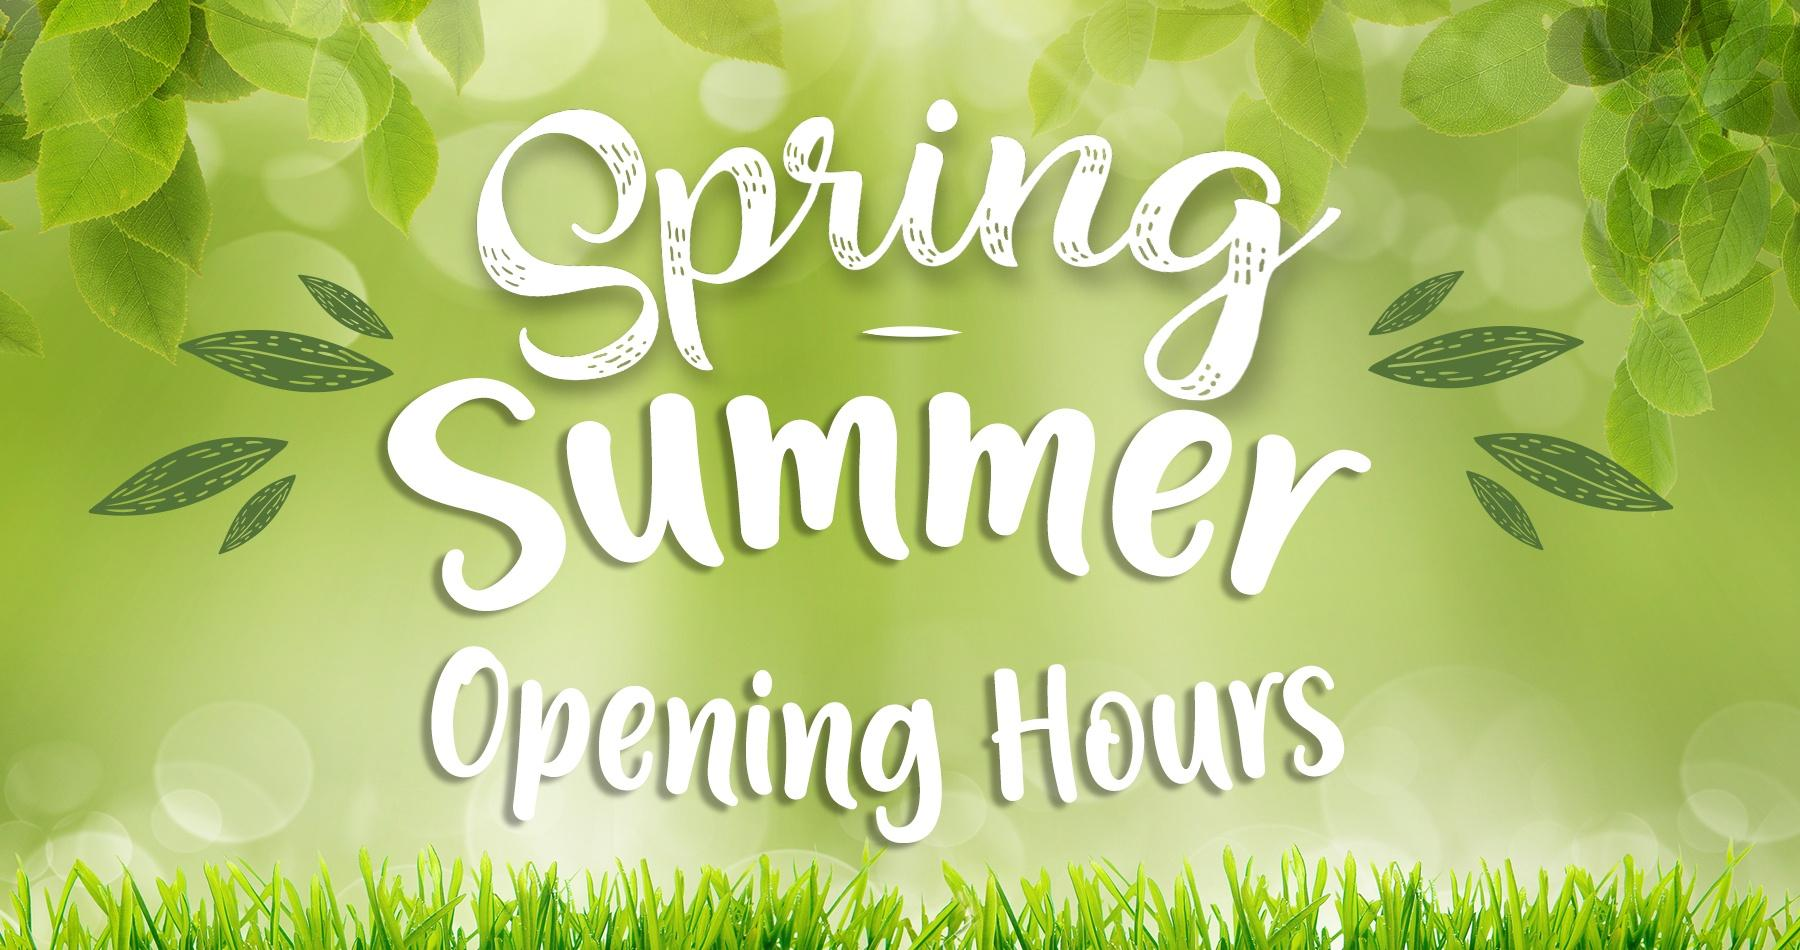 Spring Opening Hours at Earnshaws